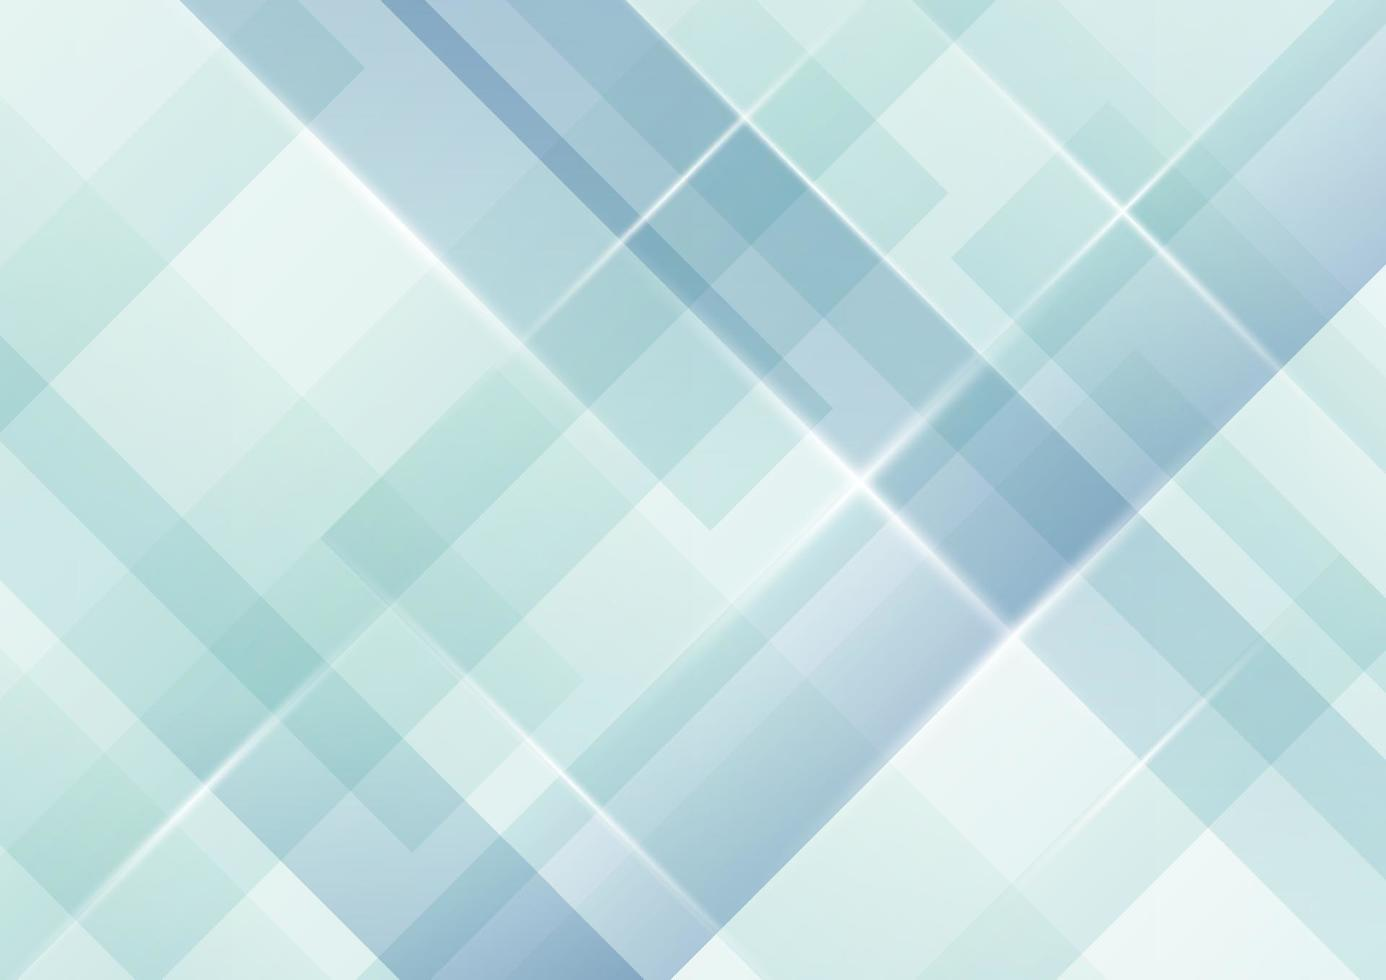 abstracte lichtblauwe strepen diagonale overlappende patroon achtergrond vector